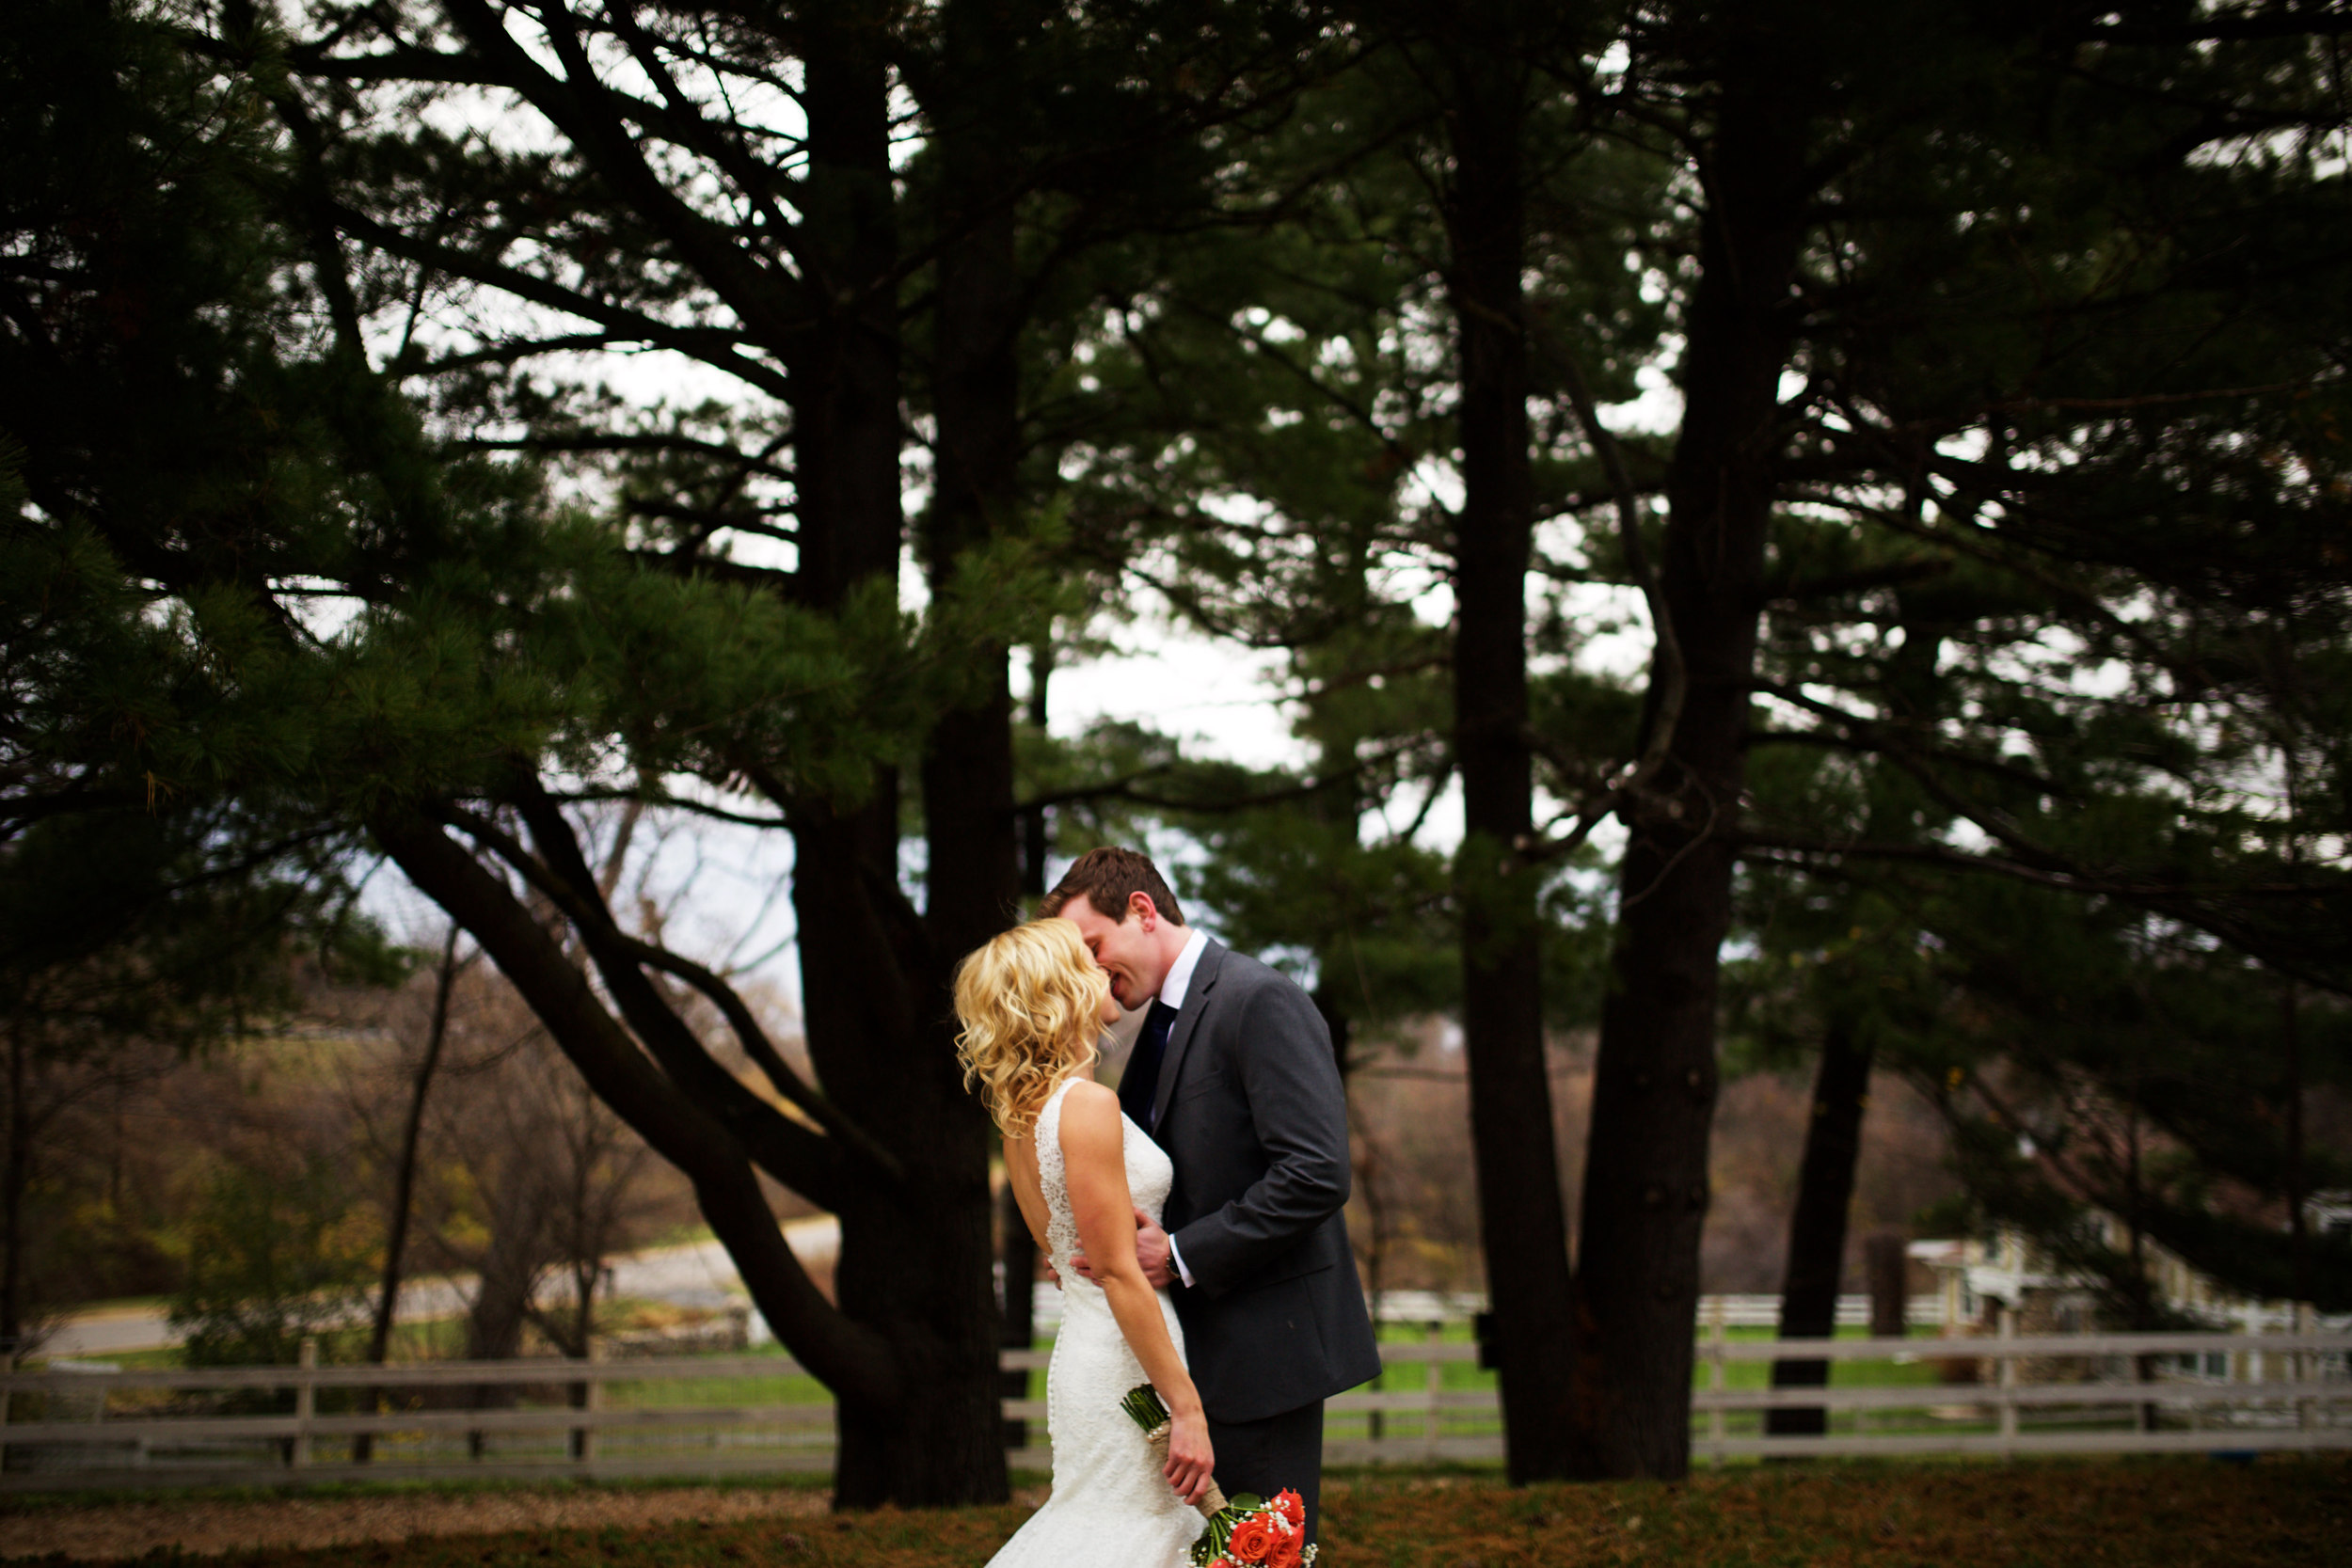 OneOne November wedding 020.jpg